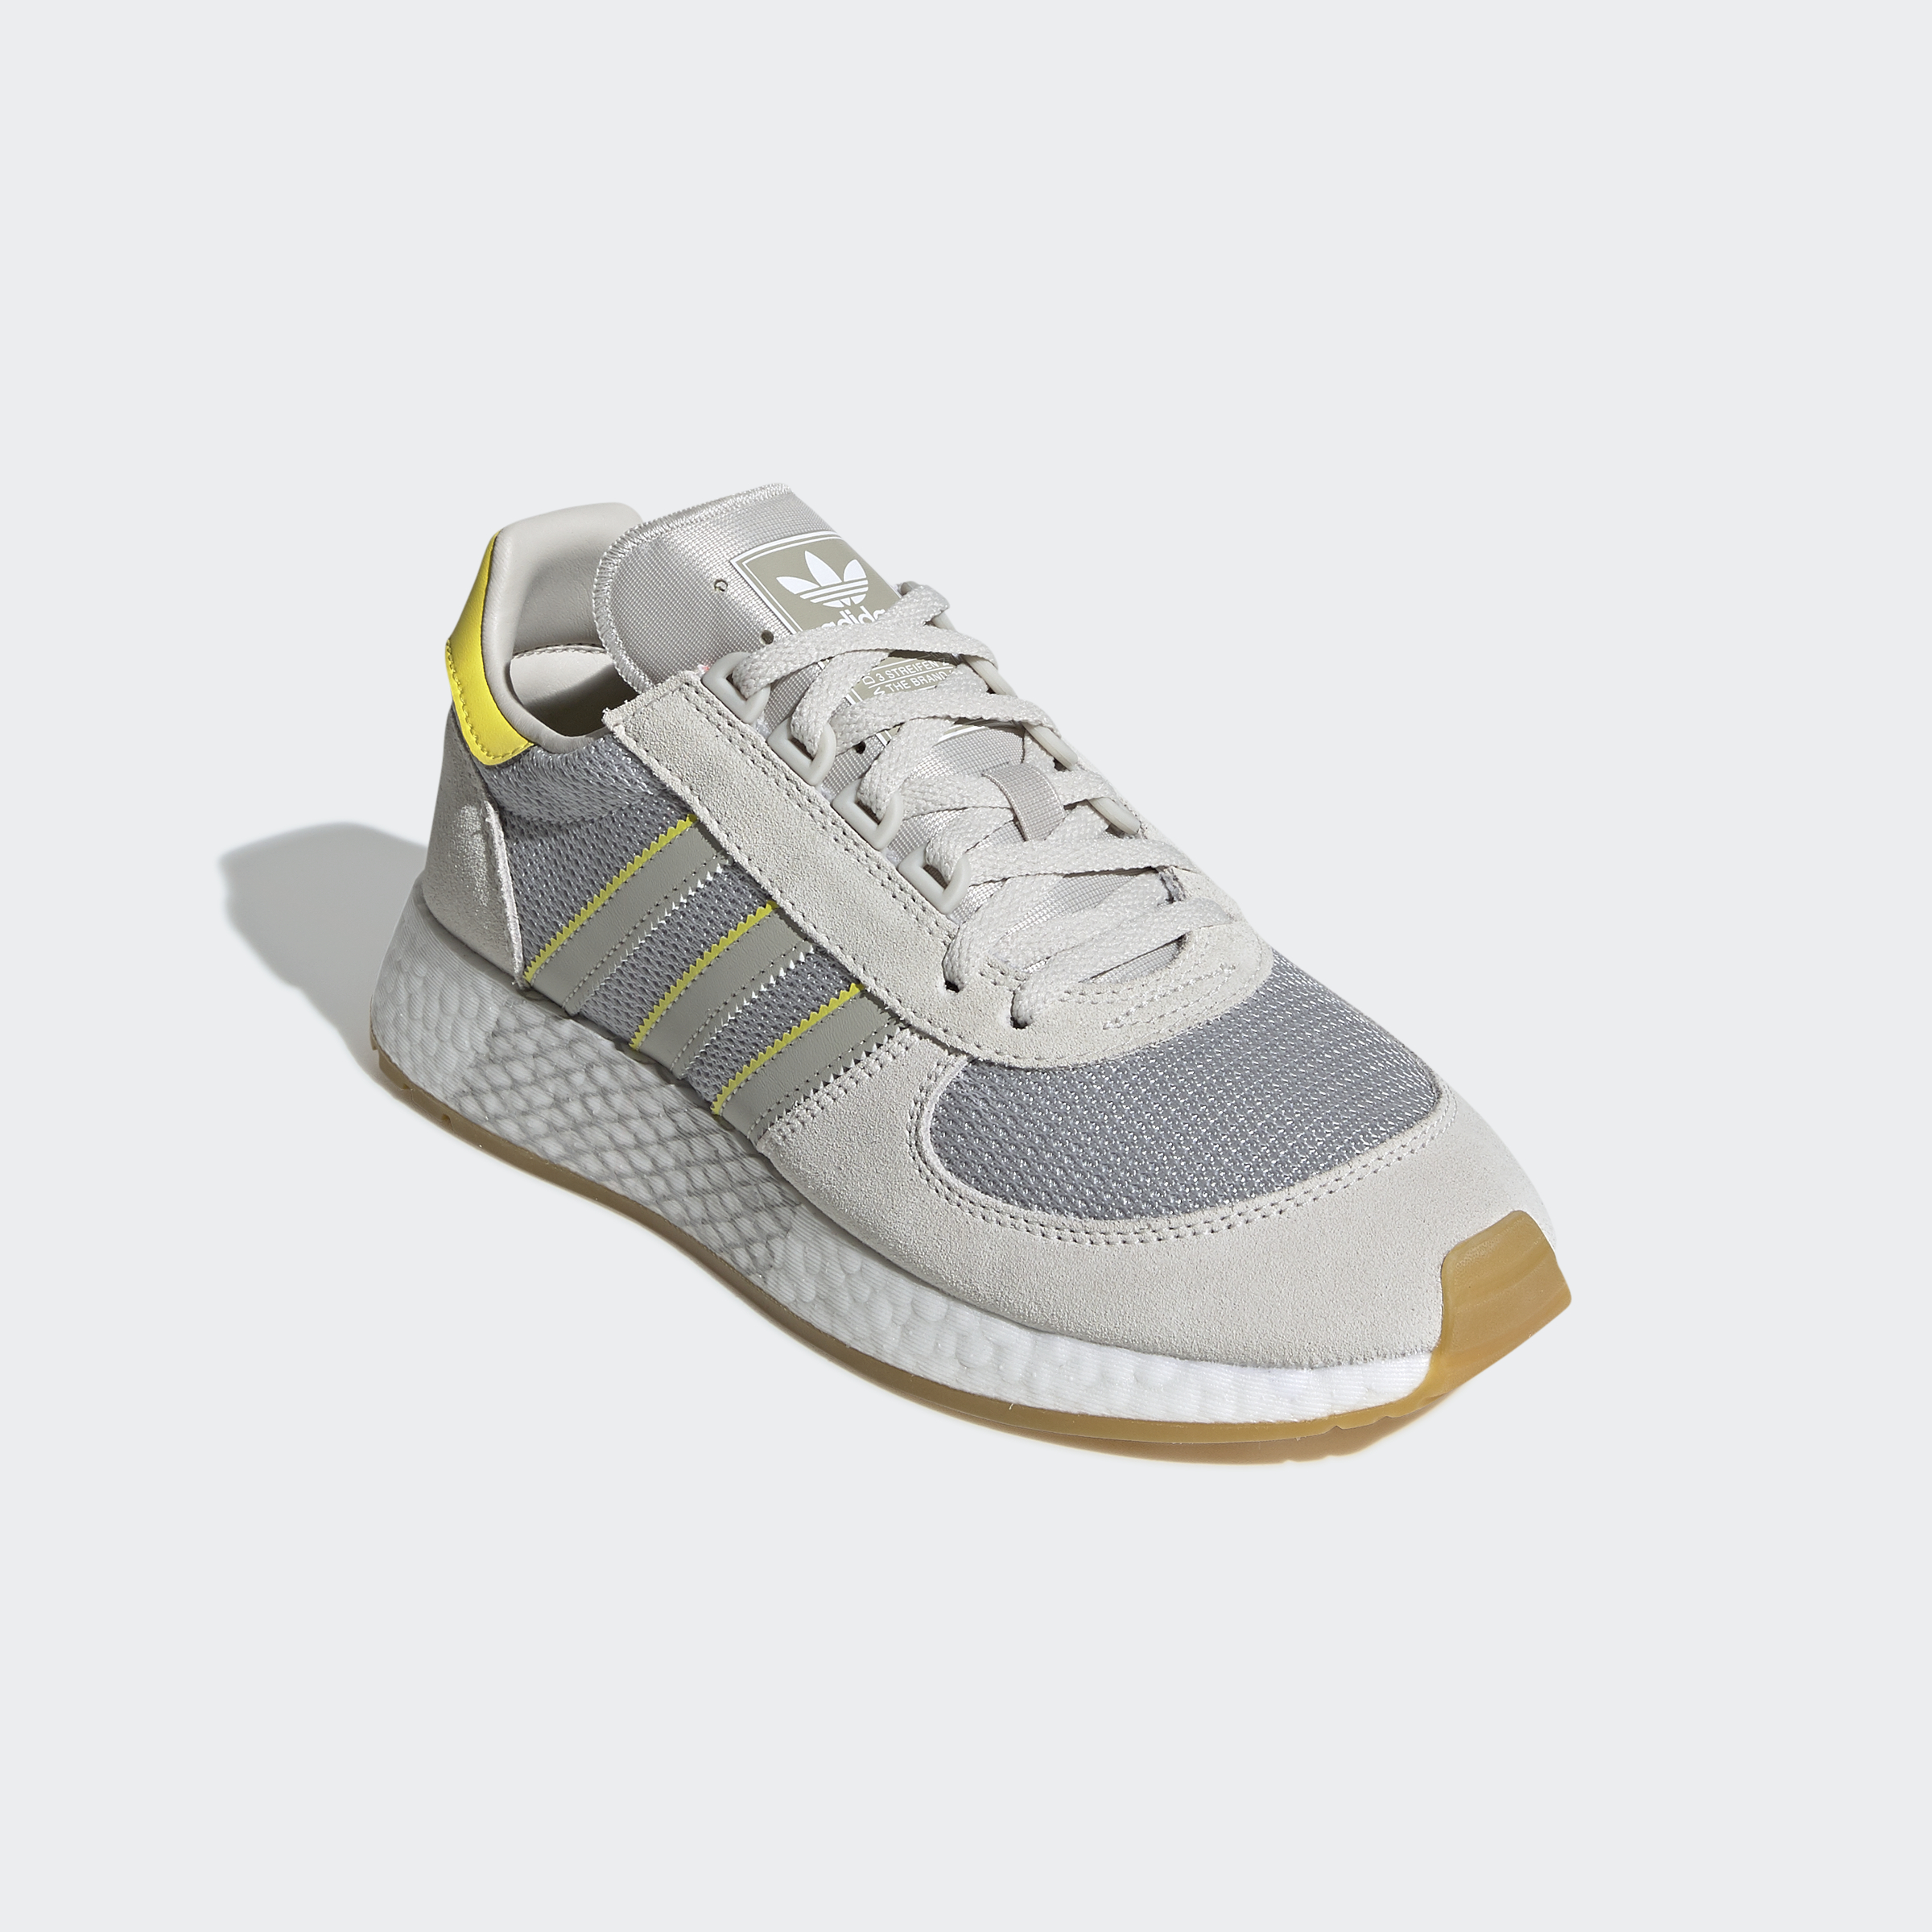 adidas-Marathon-Tech-Shoes-Women-039-s-Athletic-amp-Sneakers thumbnail 18